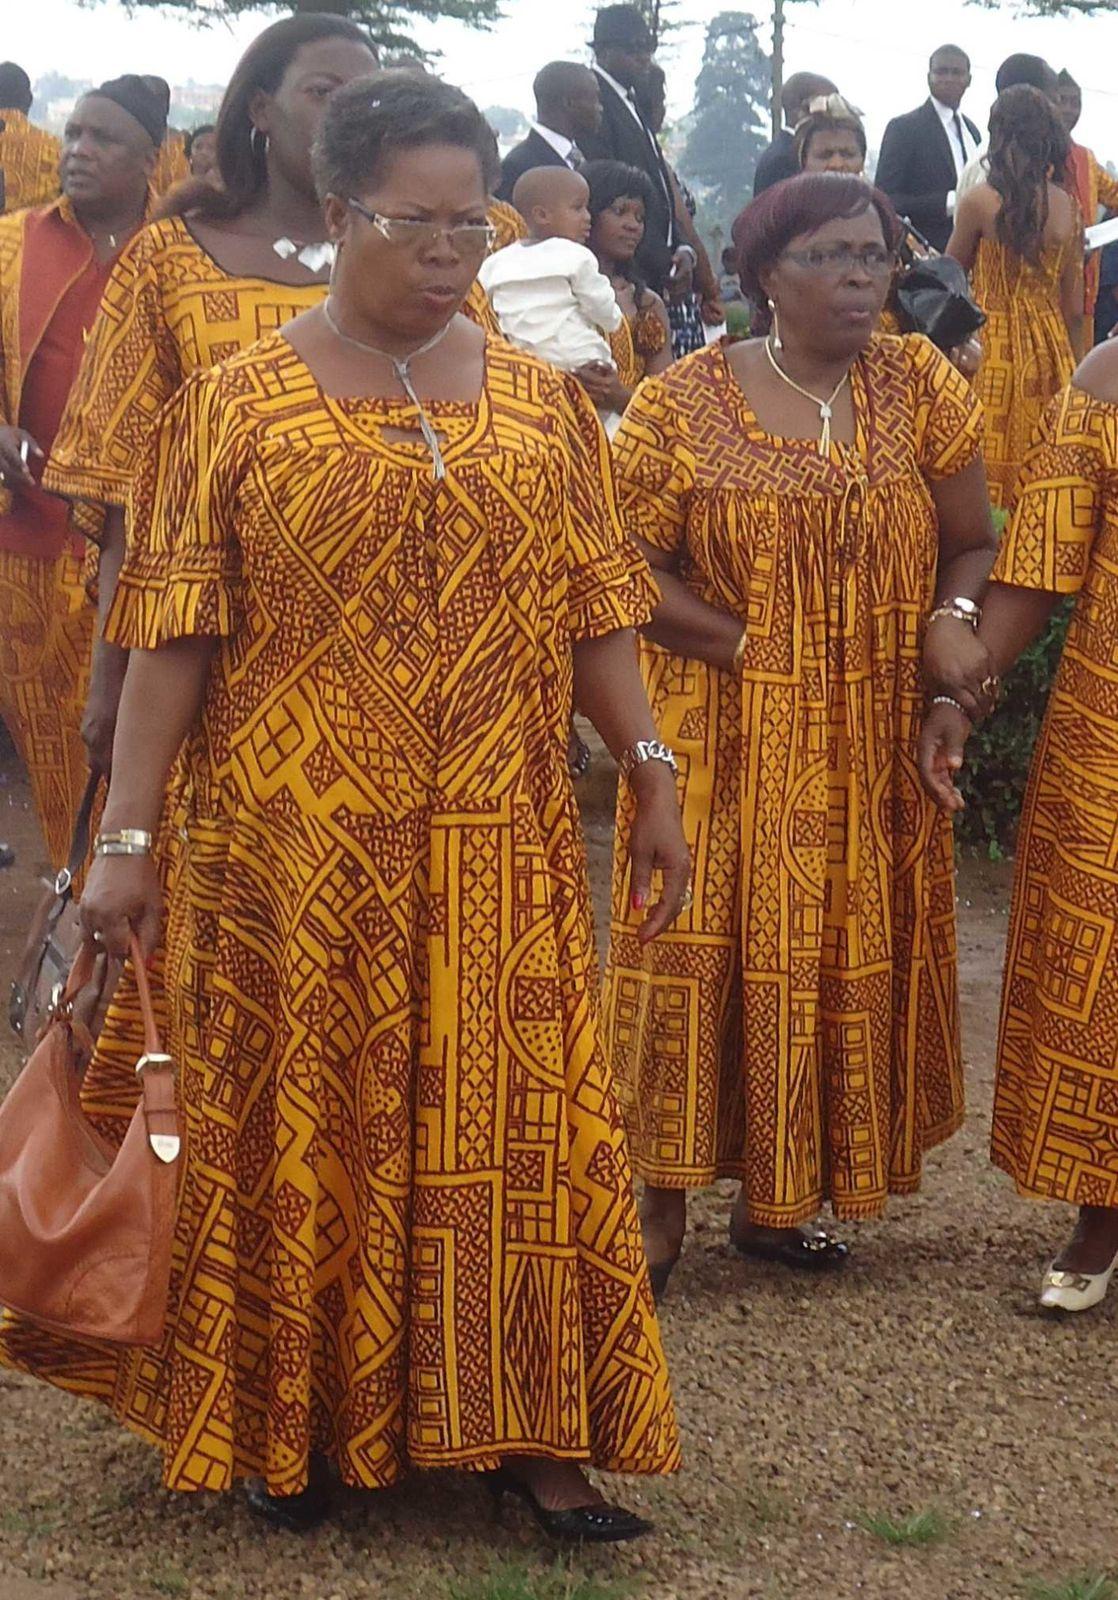 Recherche femmes camerounaises pour mariage